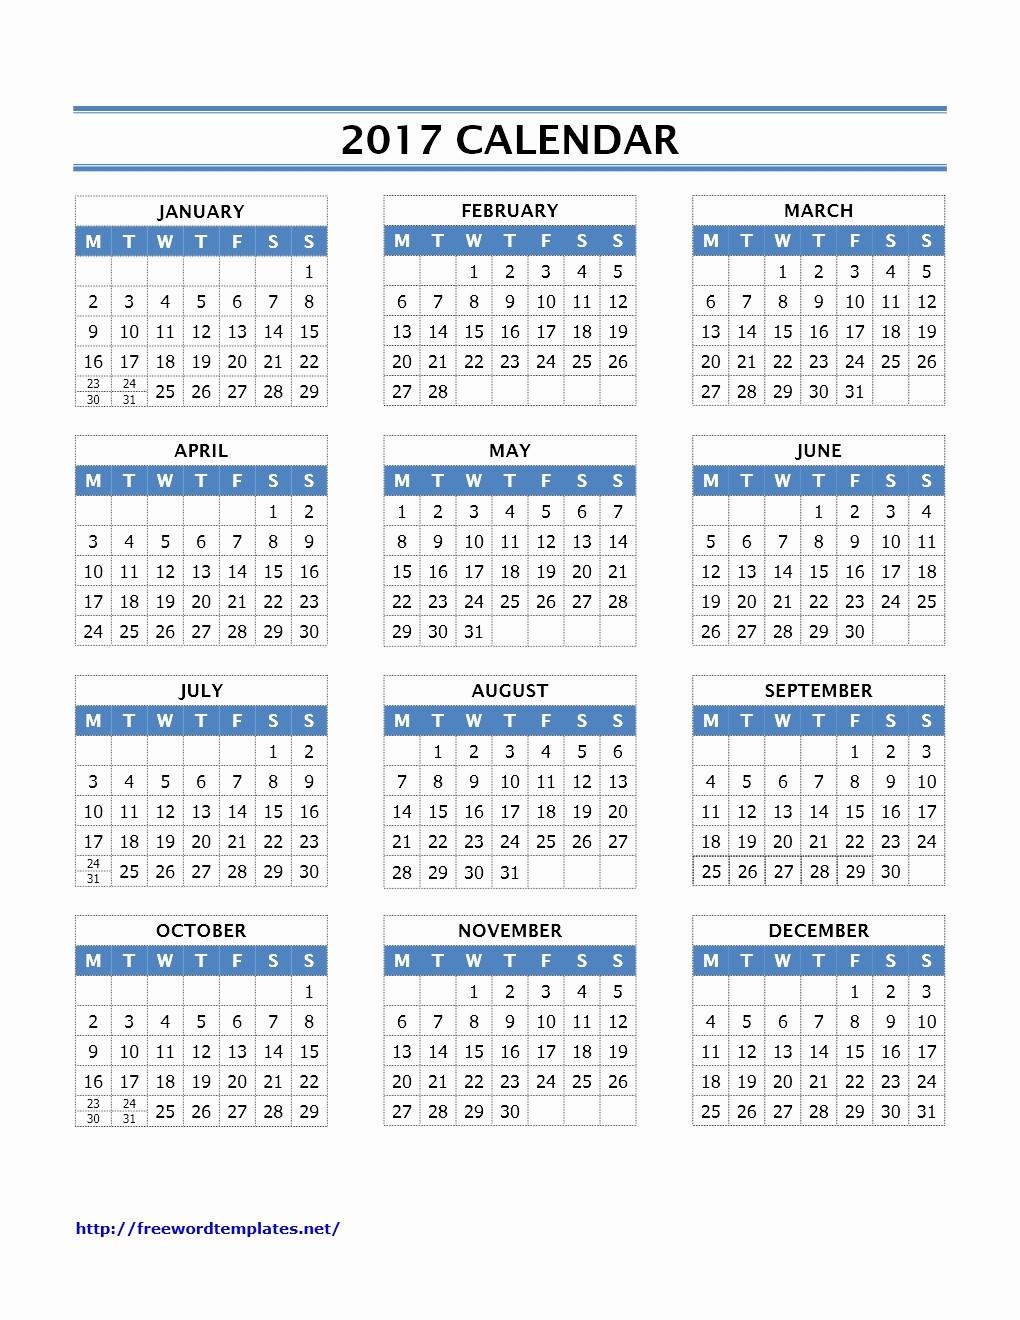 2017 Calendar Template Word Document Lovely 2017 Calendar Templates